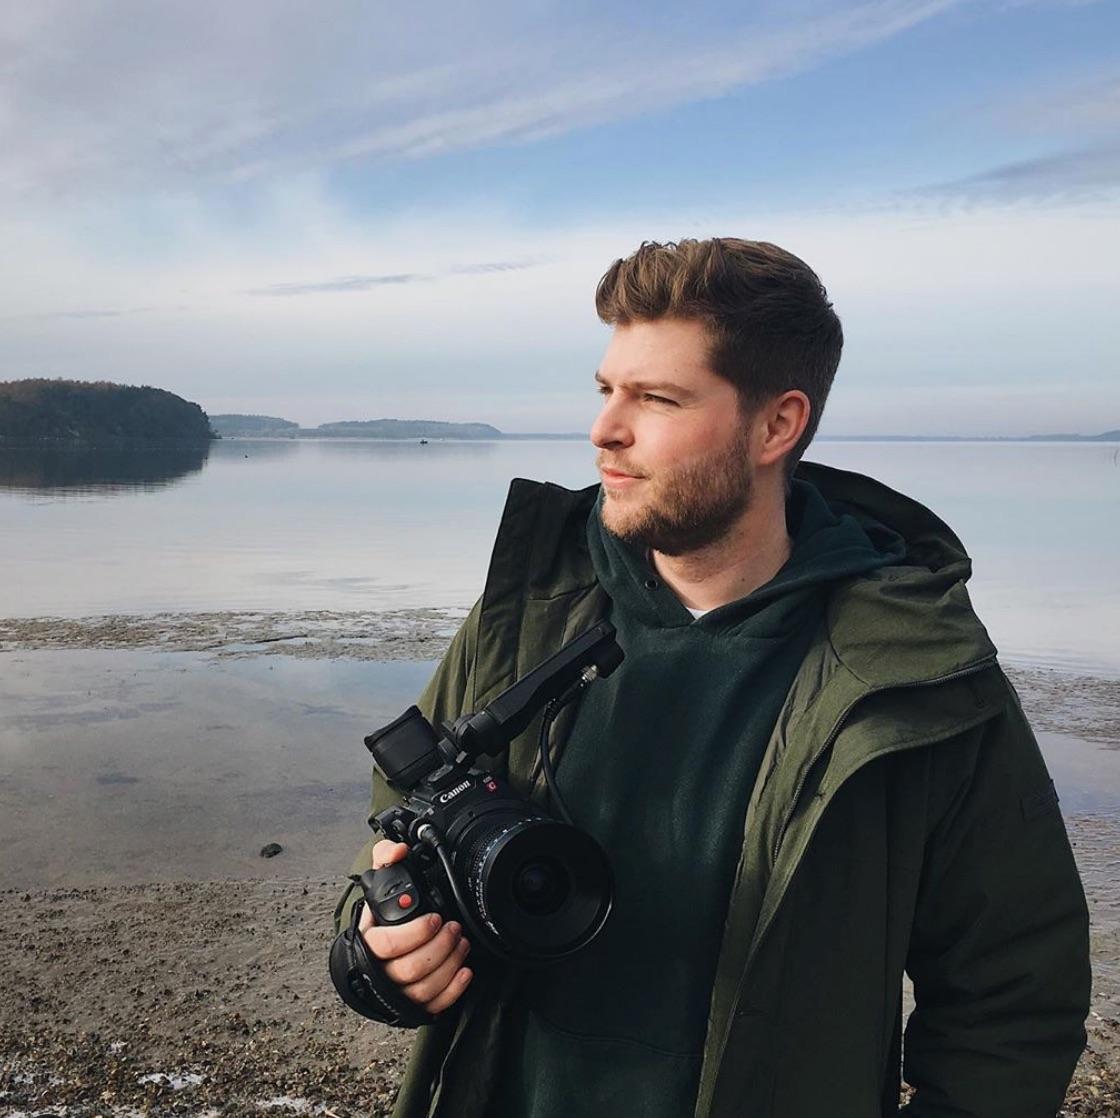 Traumberuf: Filmemacher - Martin Flindt aka Camera Cave